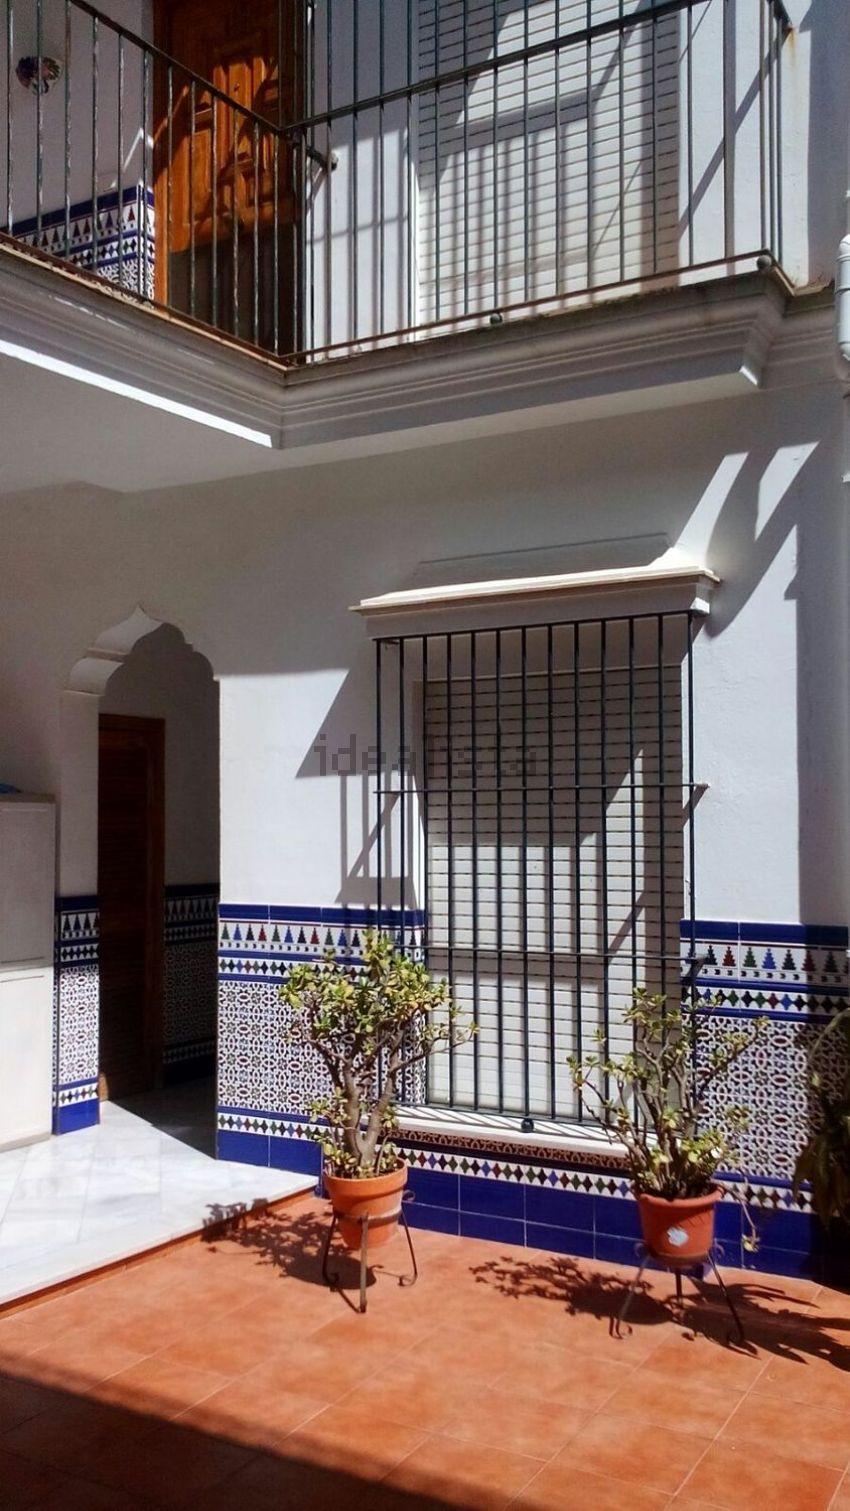 Piso en Barriada España - San Pedro, Jerez de la Frontera